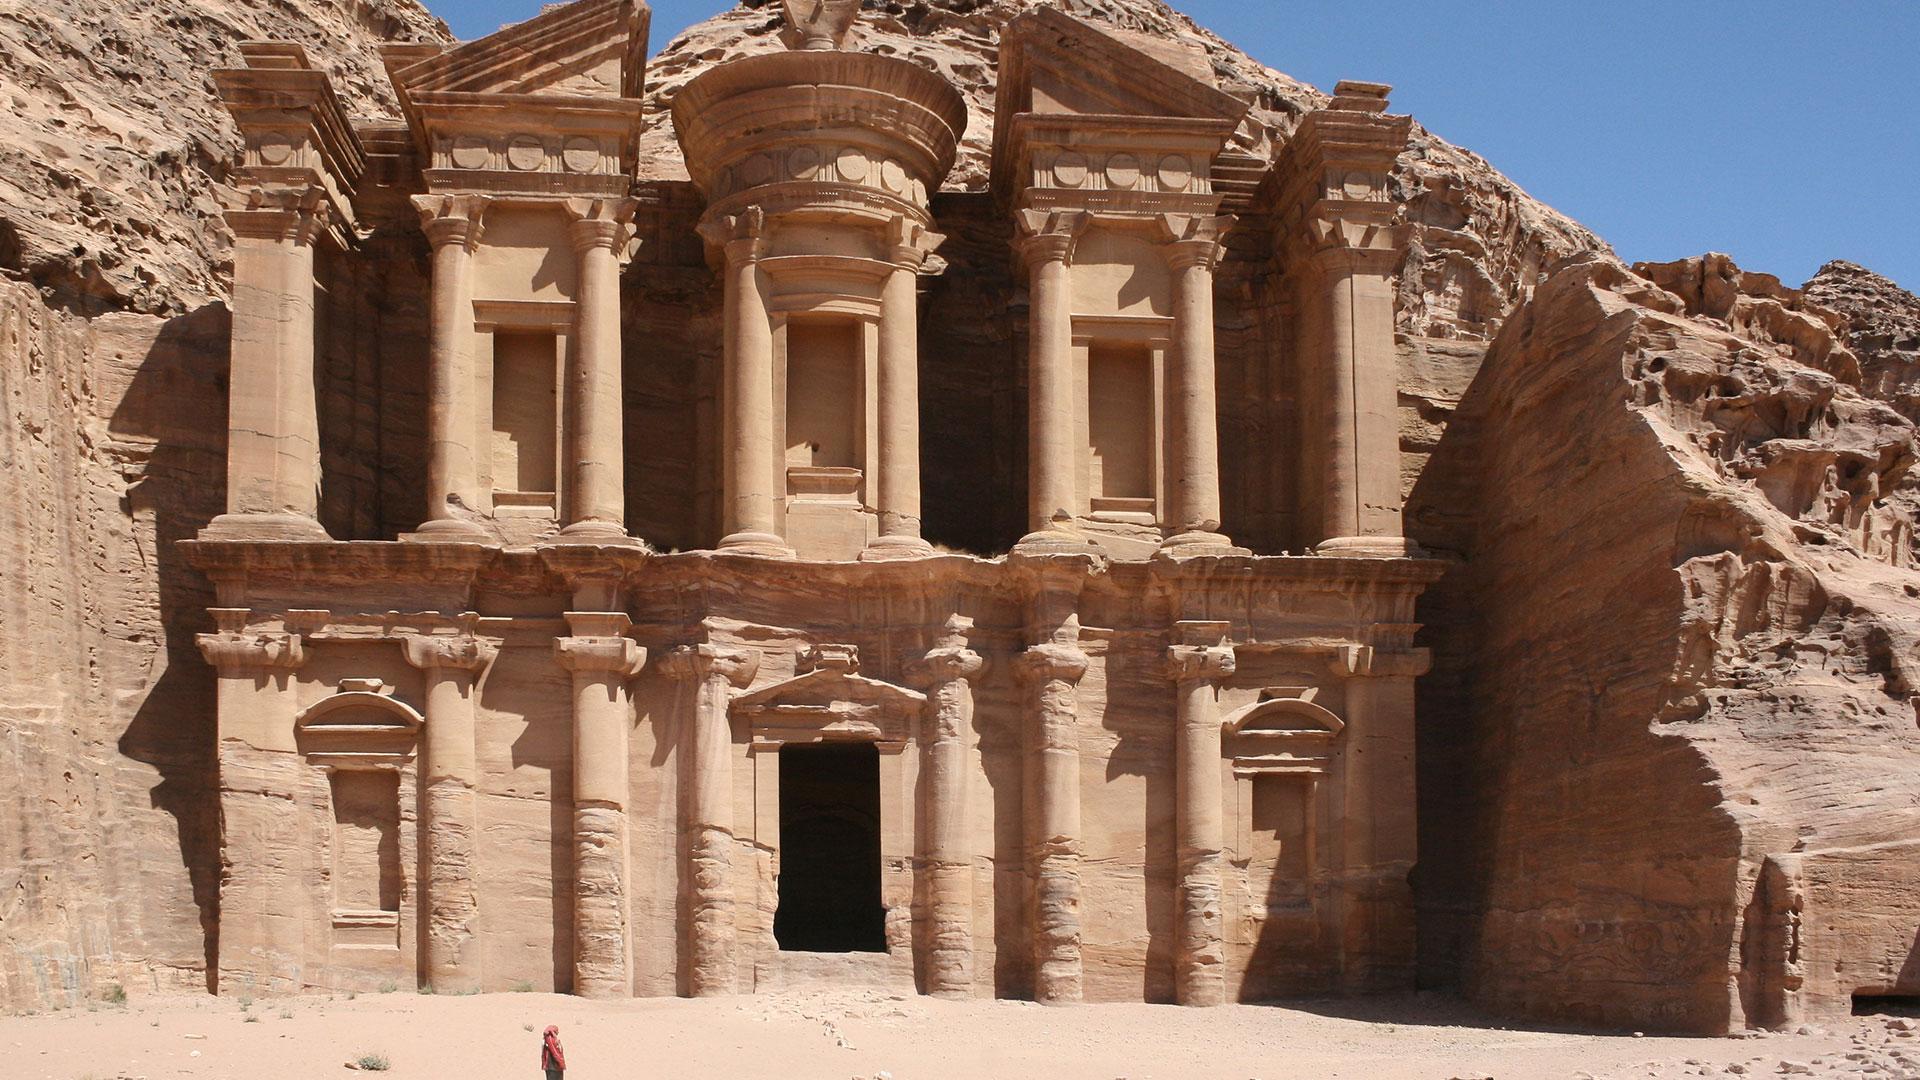 Jordania canto a la Naturaleza hero asset